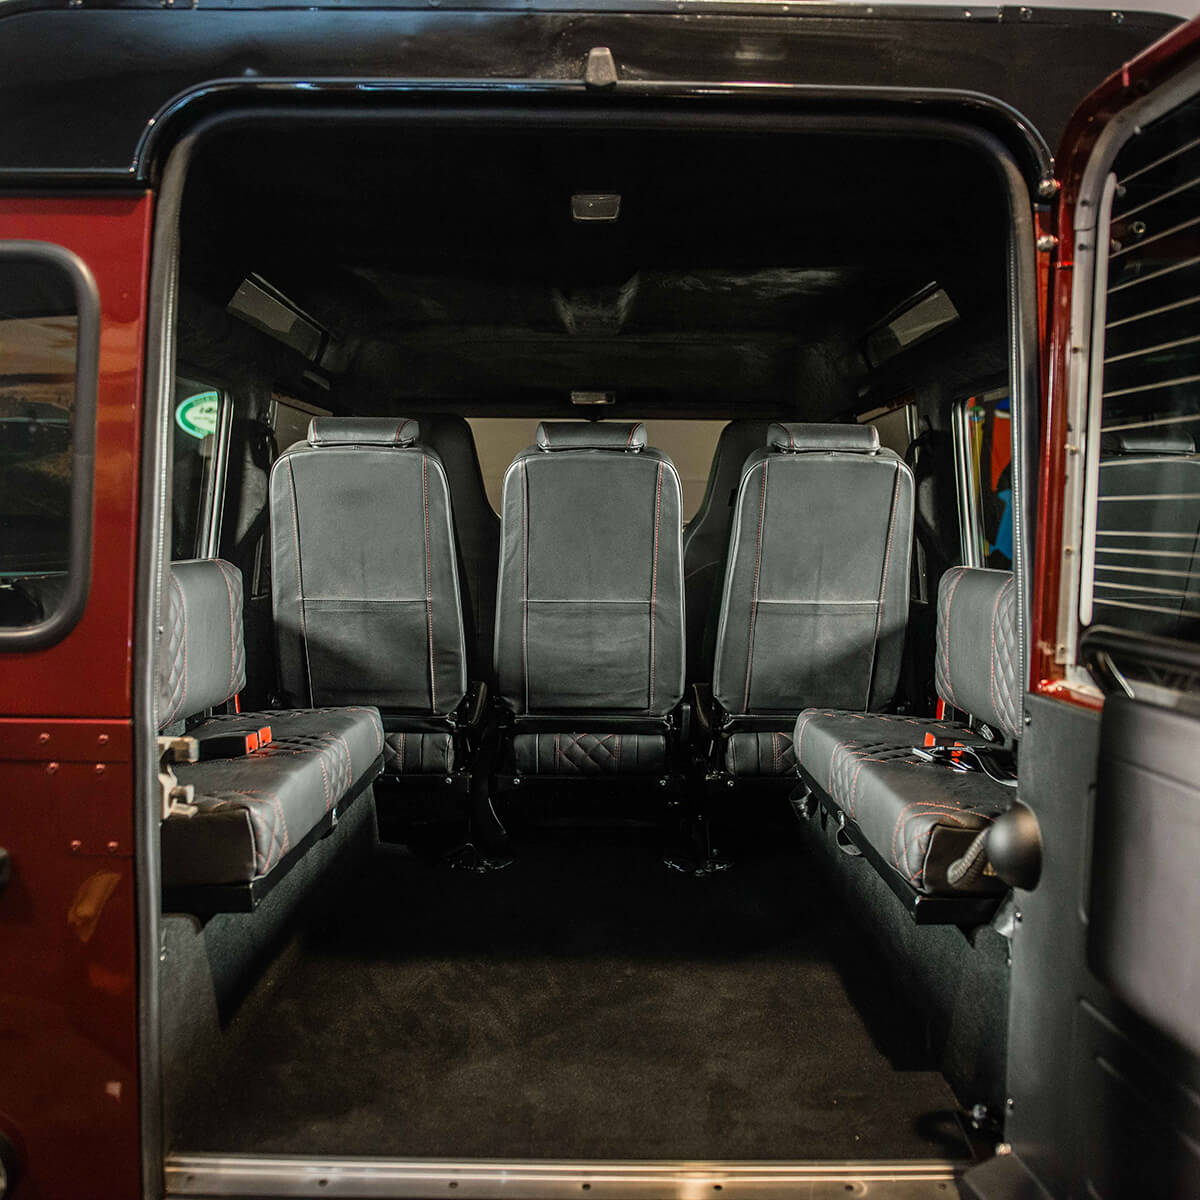 Land Rover Defender D110: Interior Load Area Seats